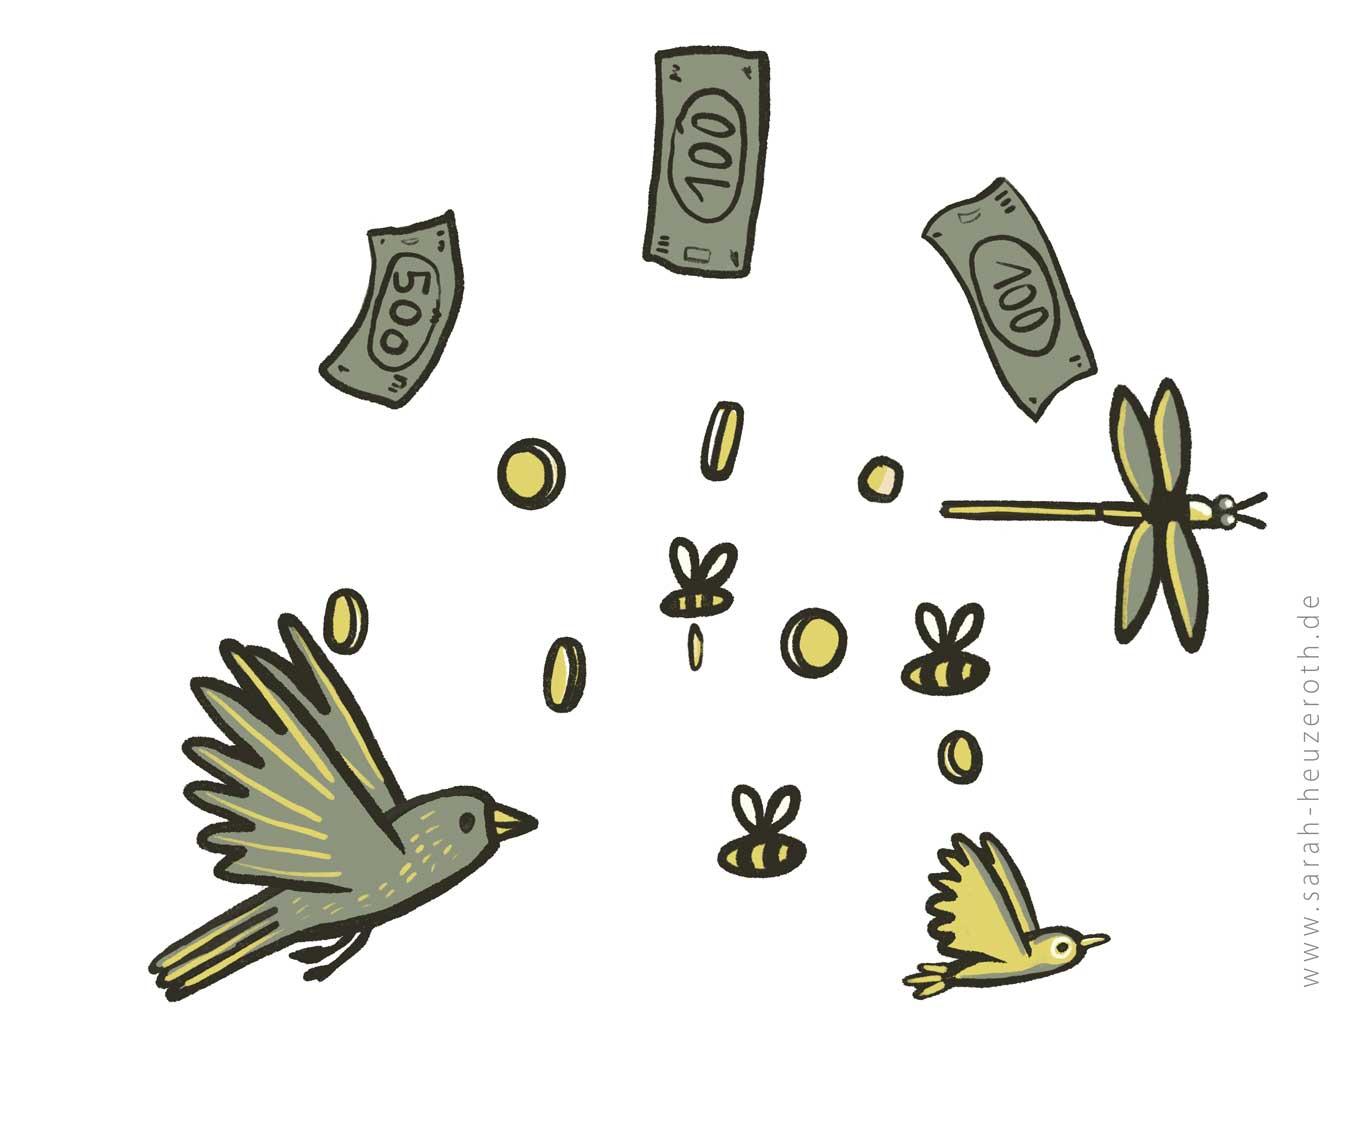 RobinWood_Geld_Und_Vögel_sarahheuzeroth